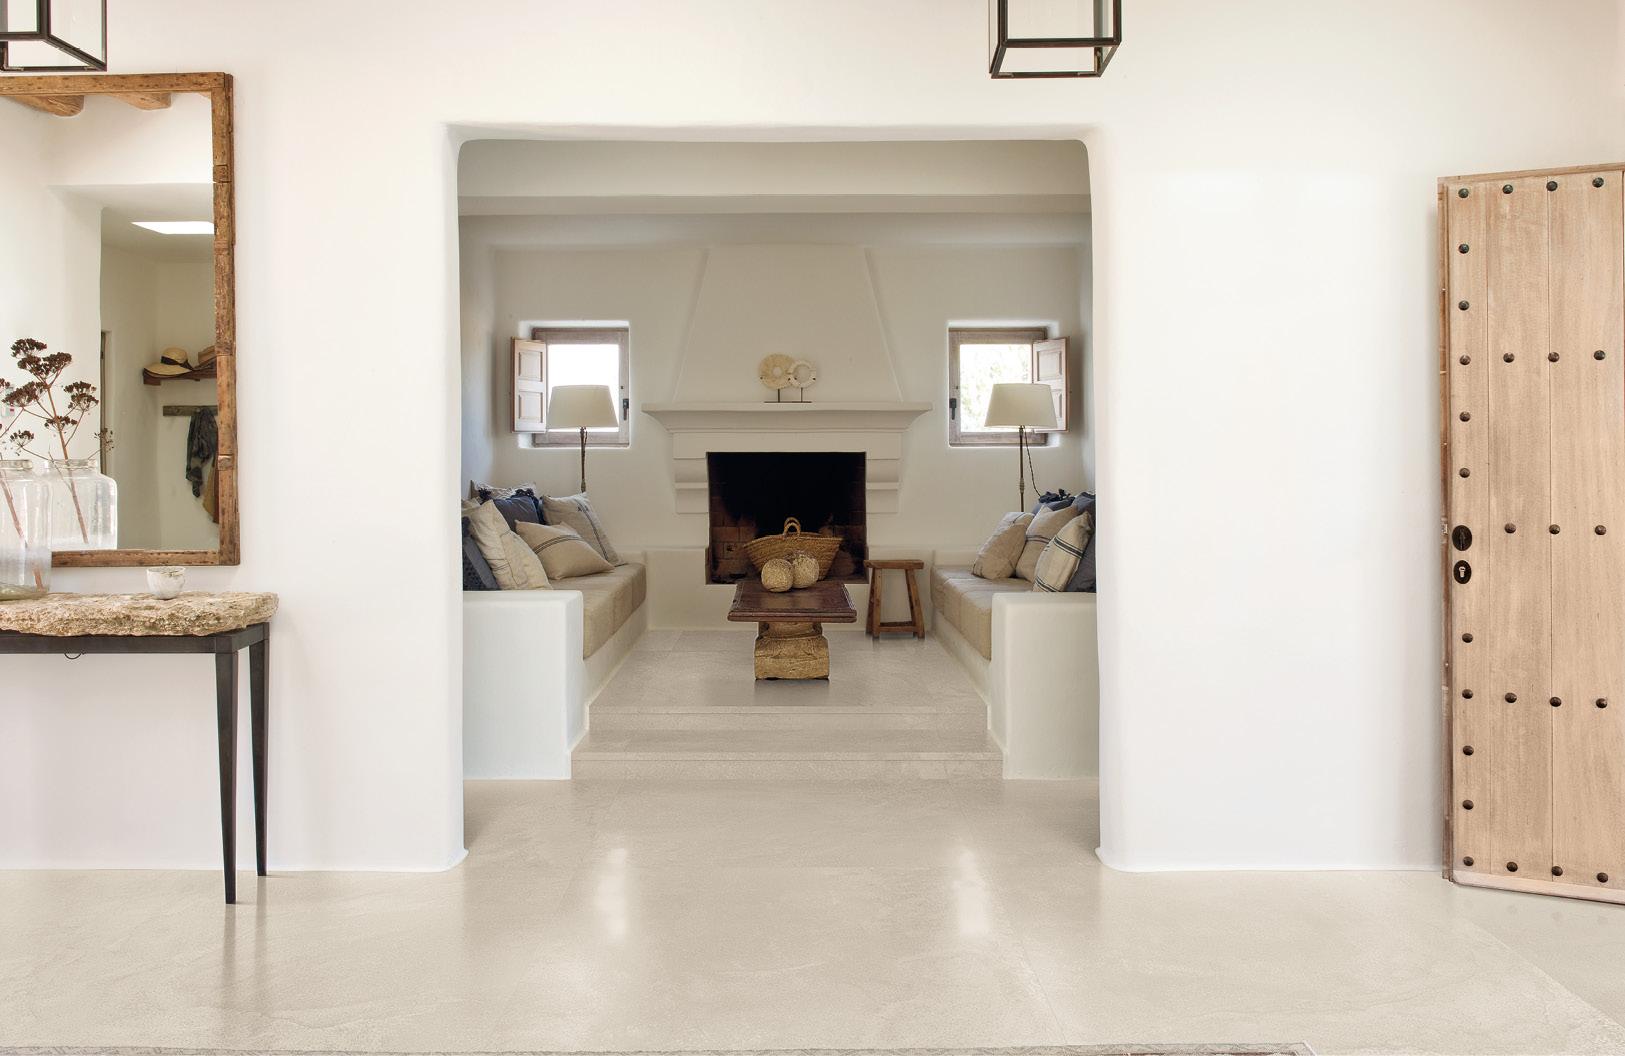 beton mineral sur carrelage salle de bain beau image 128 best carrelage salle de bains images on. Black Bedroom Furniture Sets. Home Design Ideas